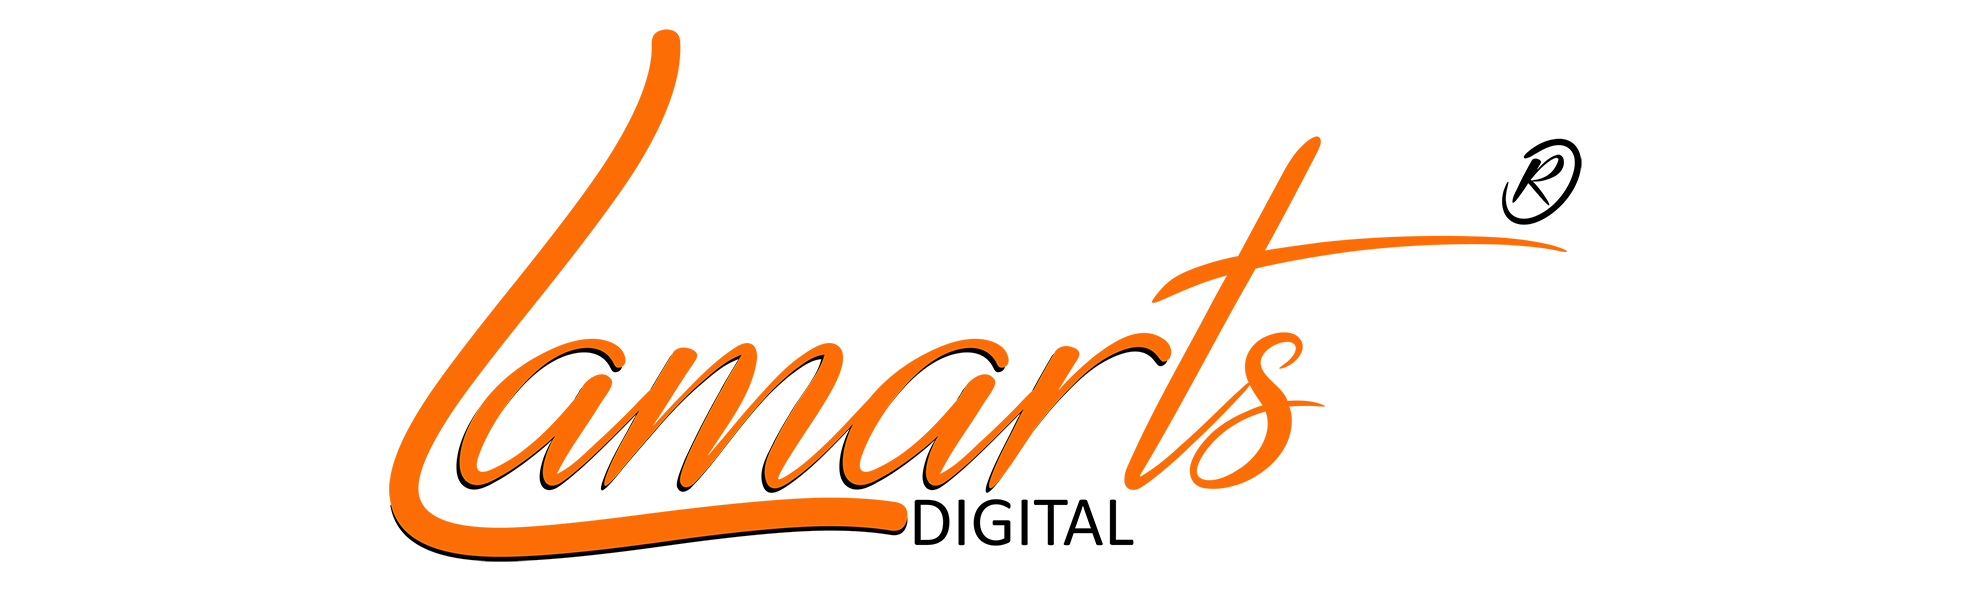 Contate Fotografia e Video Guimarães - lamarts Digital - Estudio Fotógrafico